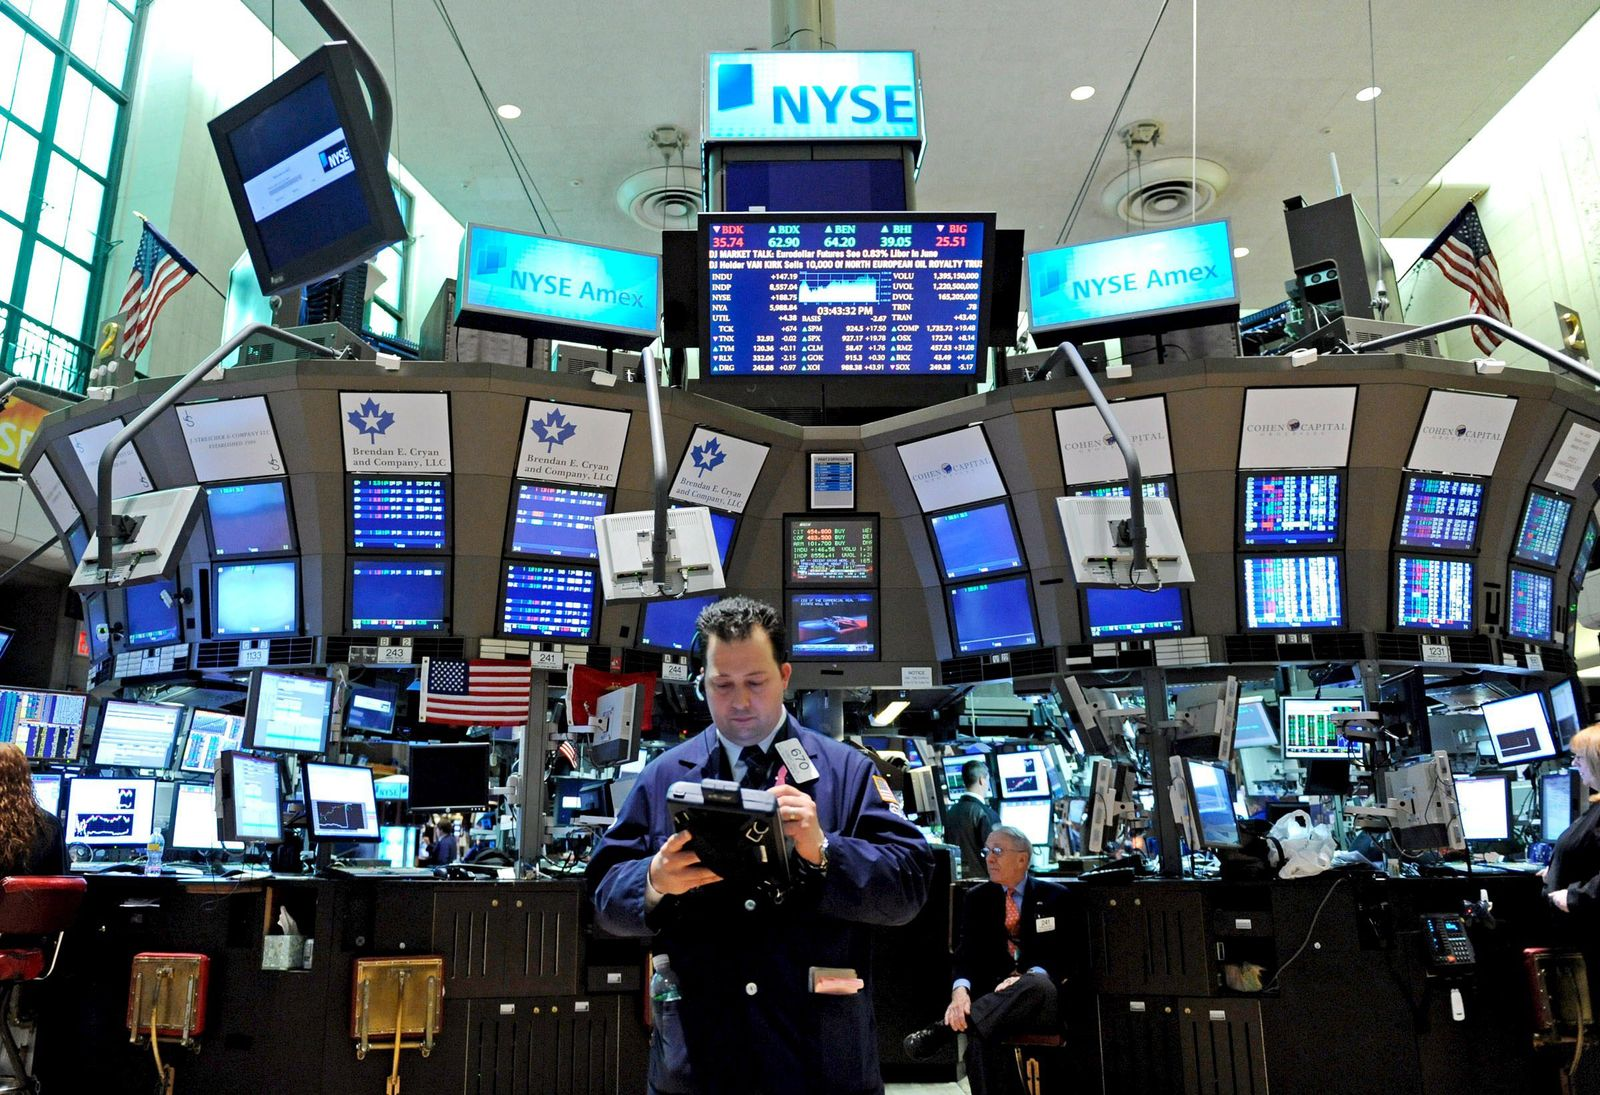 US-Börse in New York (Kopie)